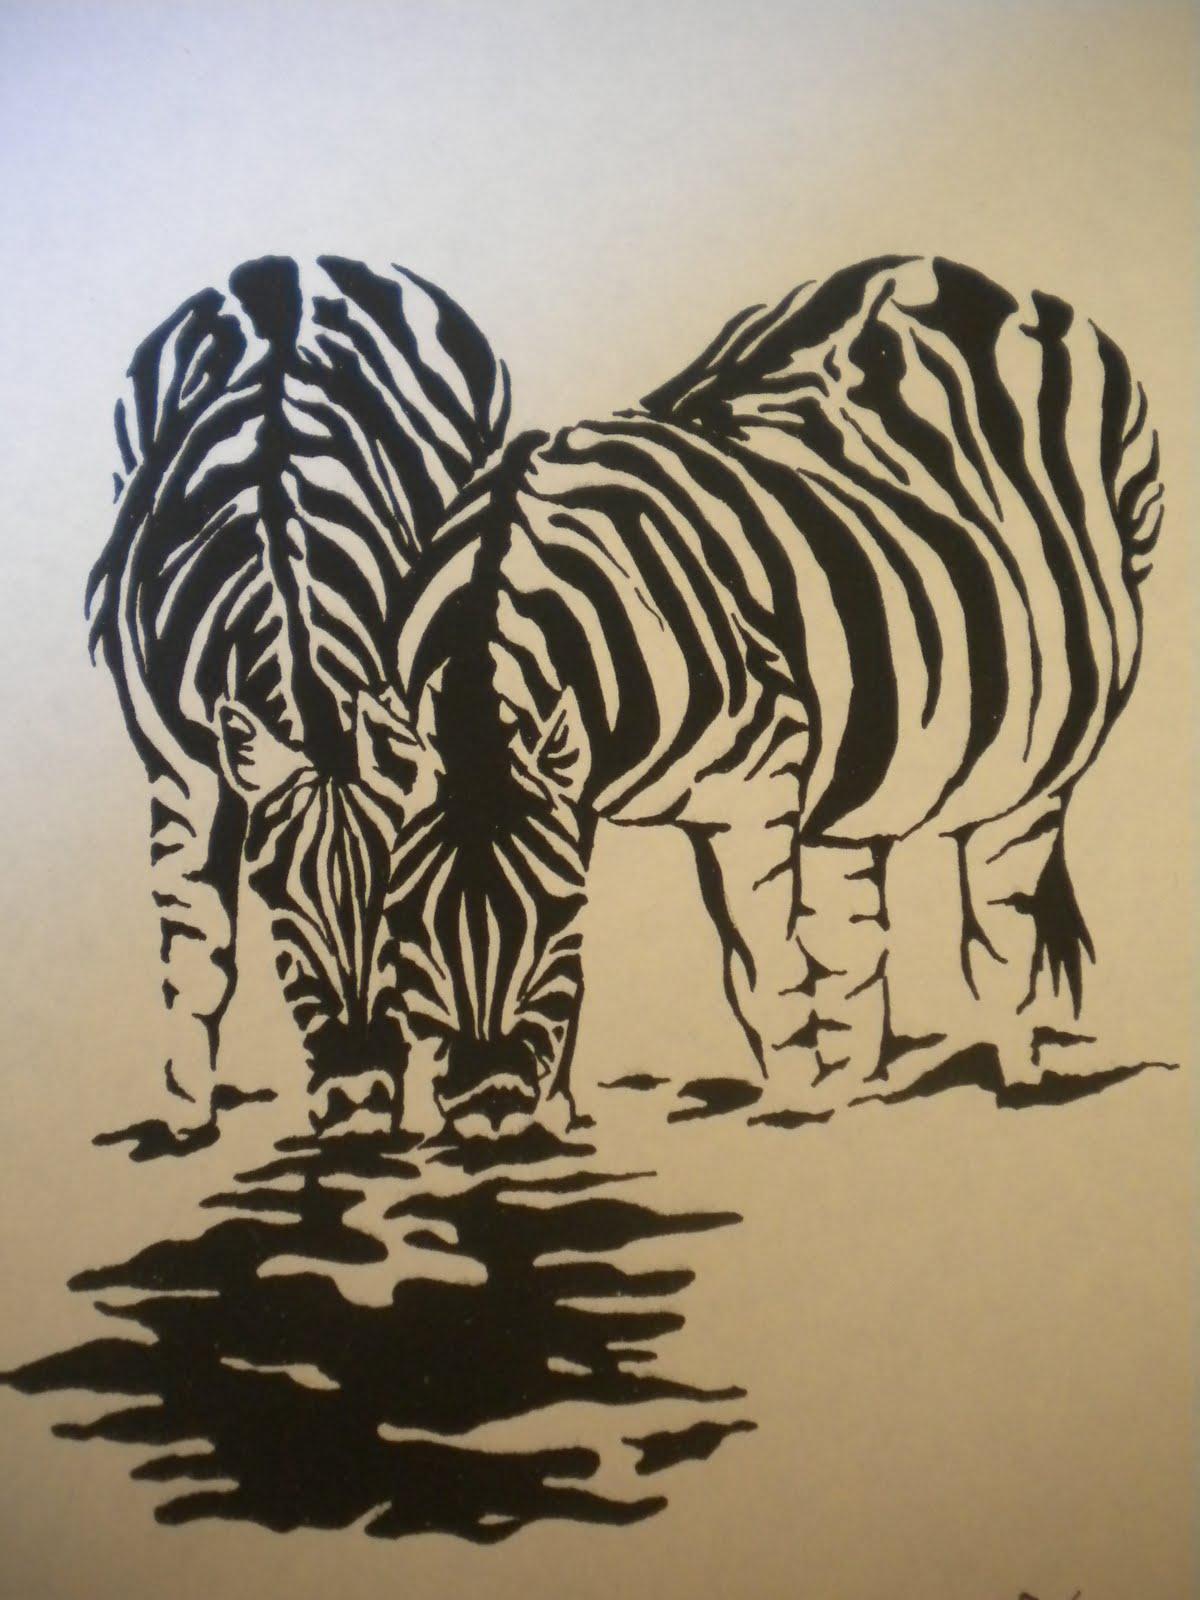 Pseudenham Crafts: Pen drawings of animals